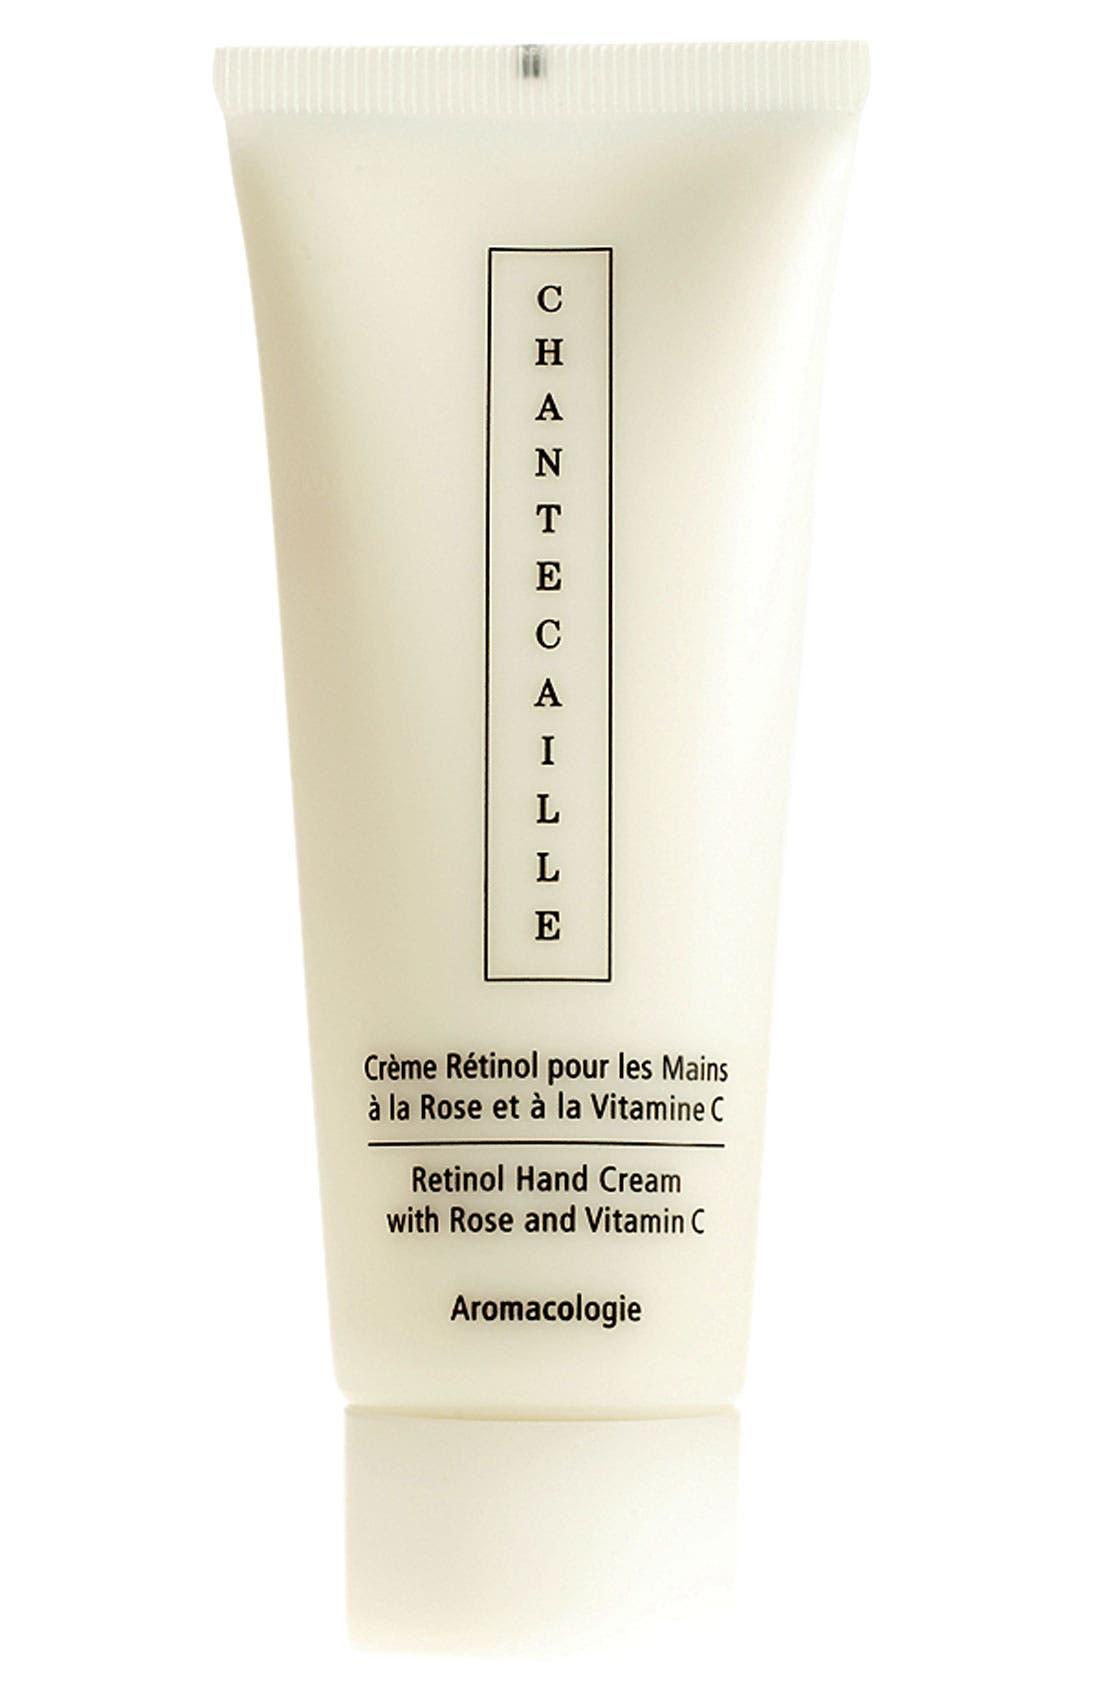 Chantecaille Retinol Hand Cream